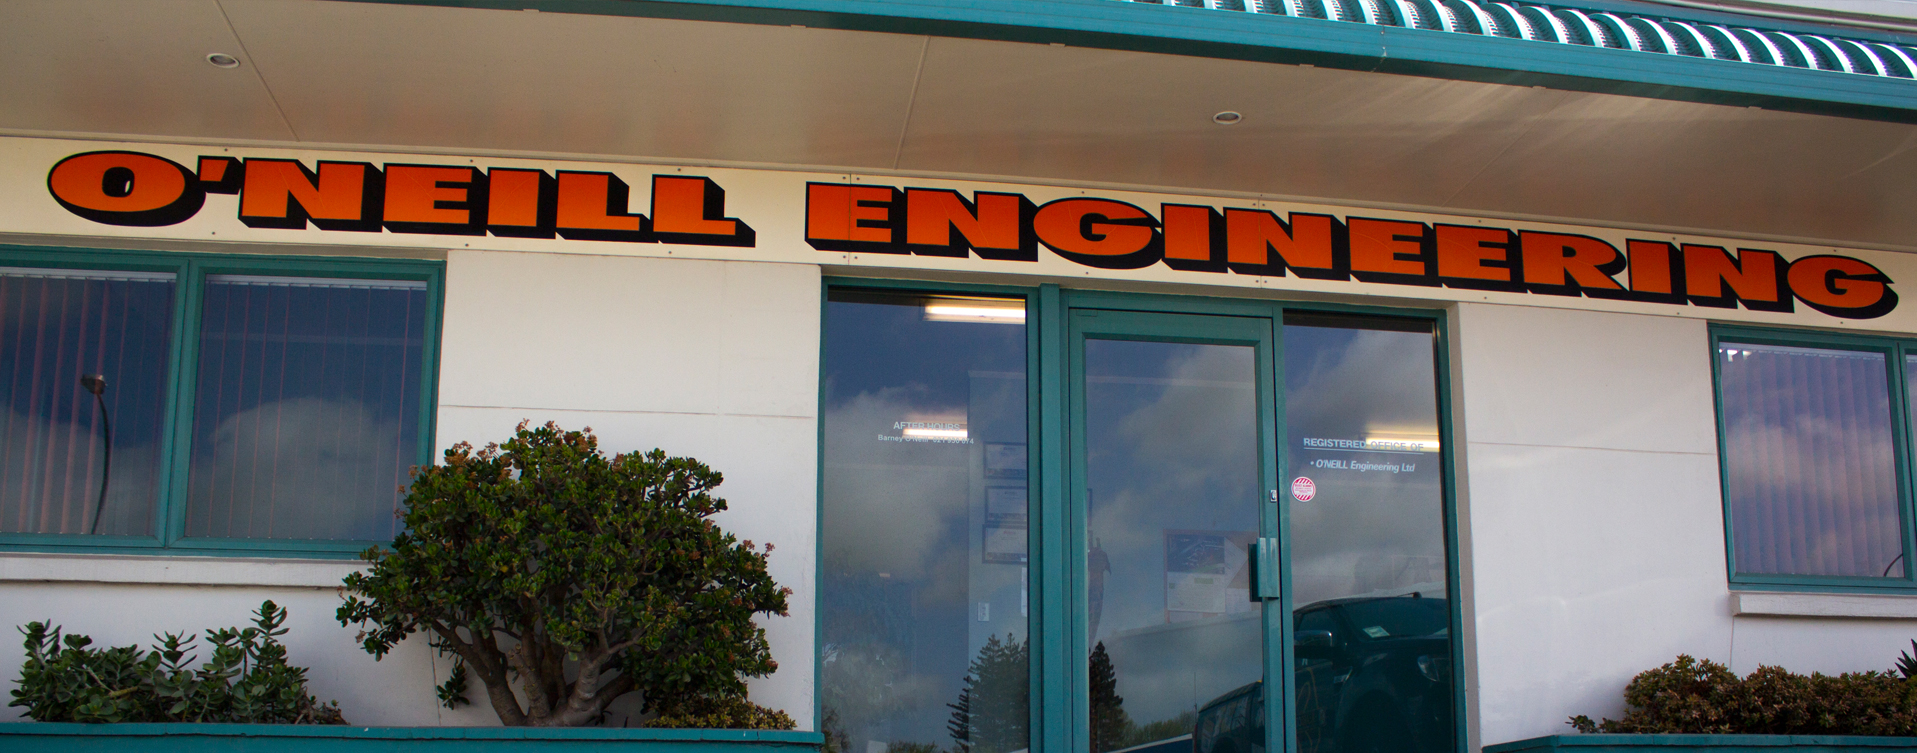 O neill engineering morrinsville engineering waikato nz for Half round buildings